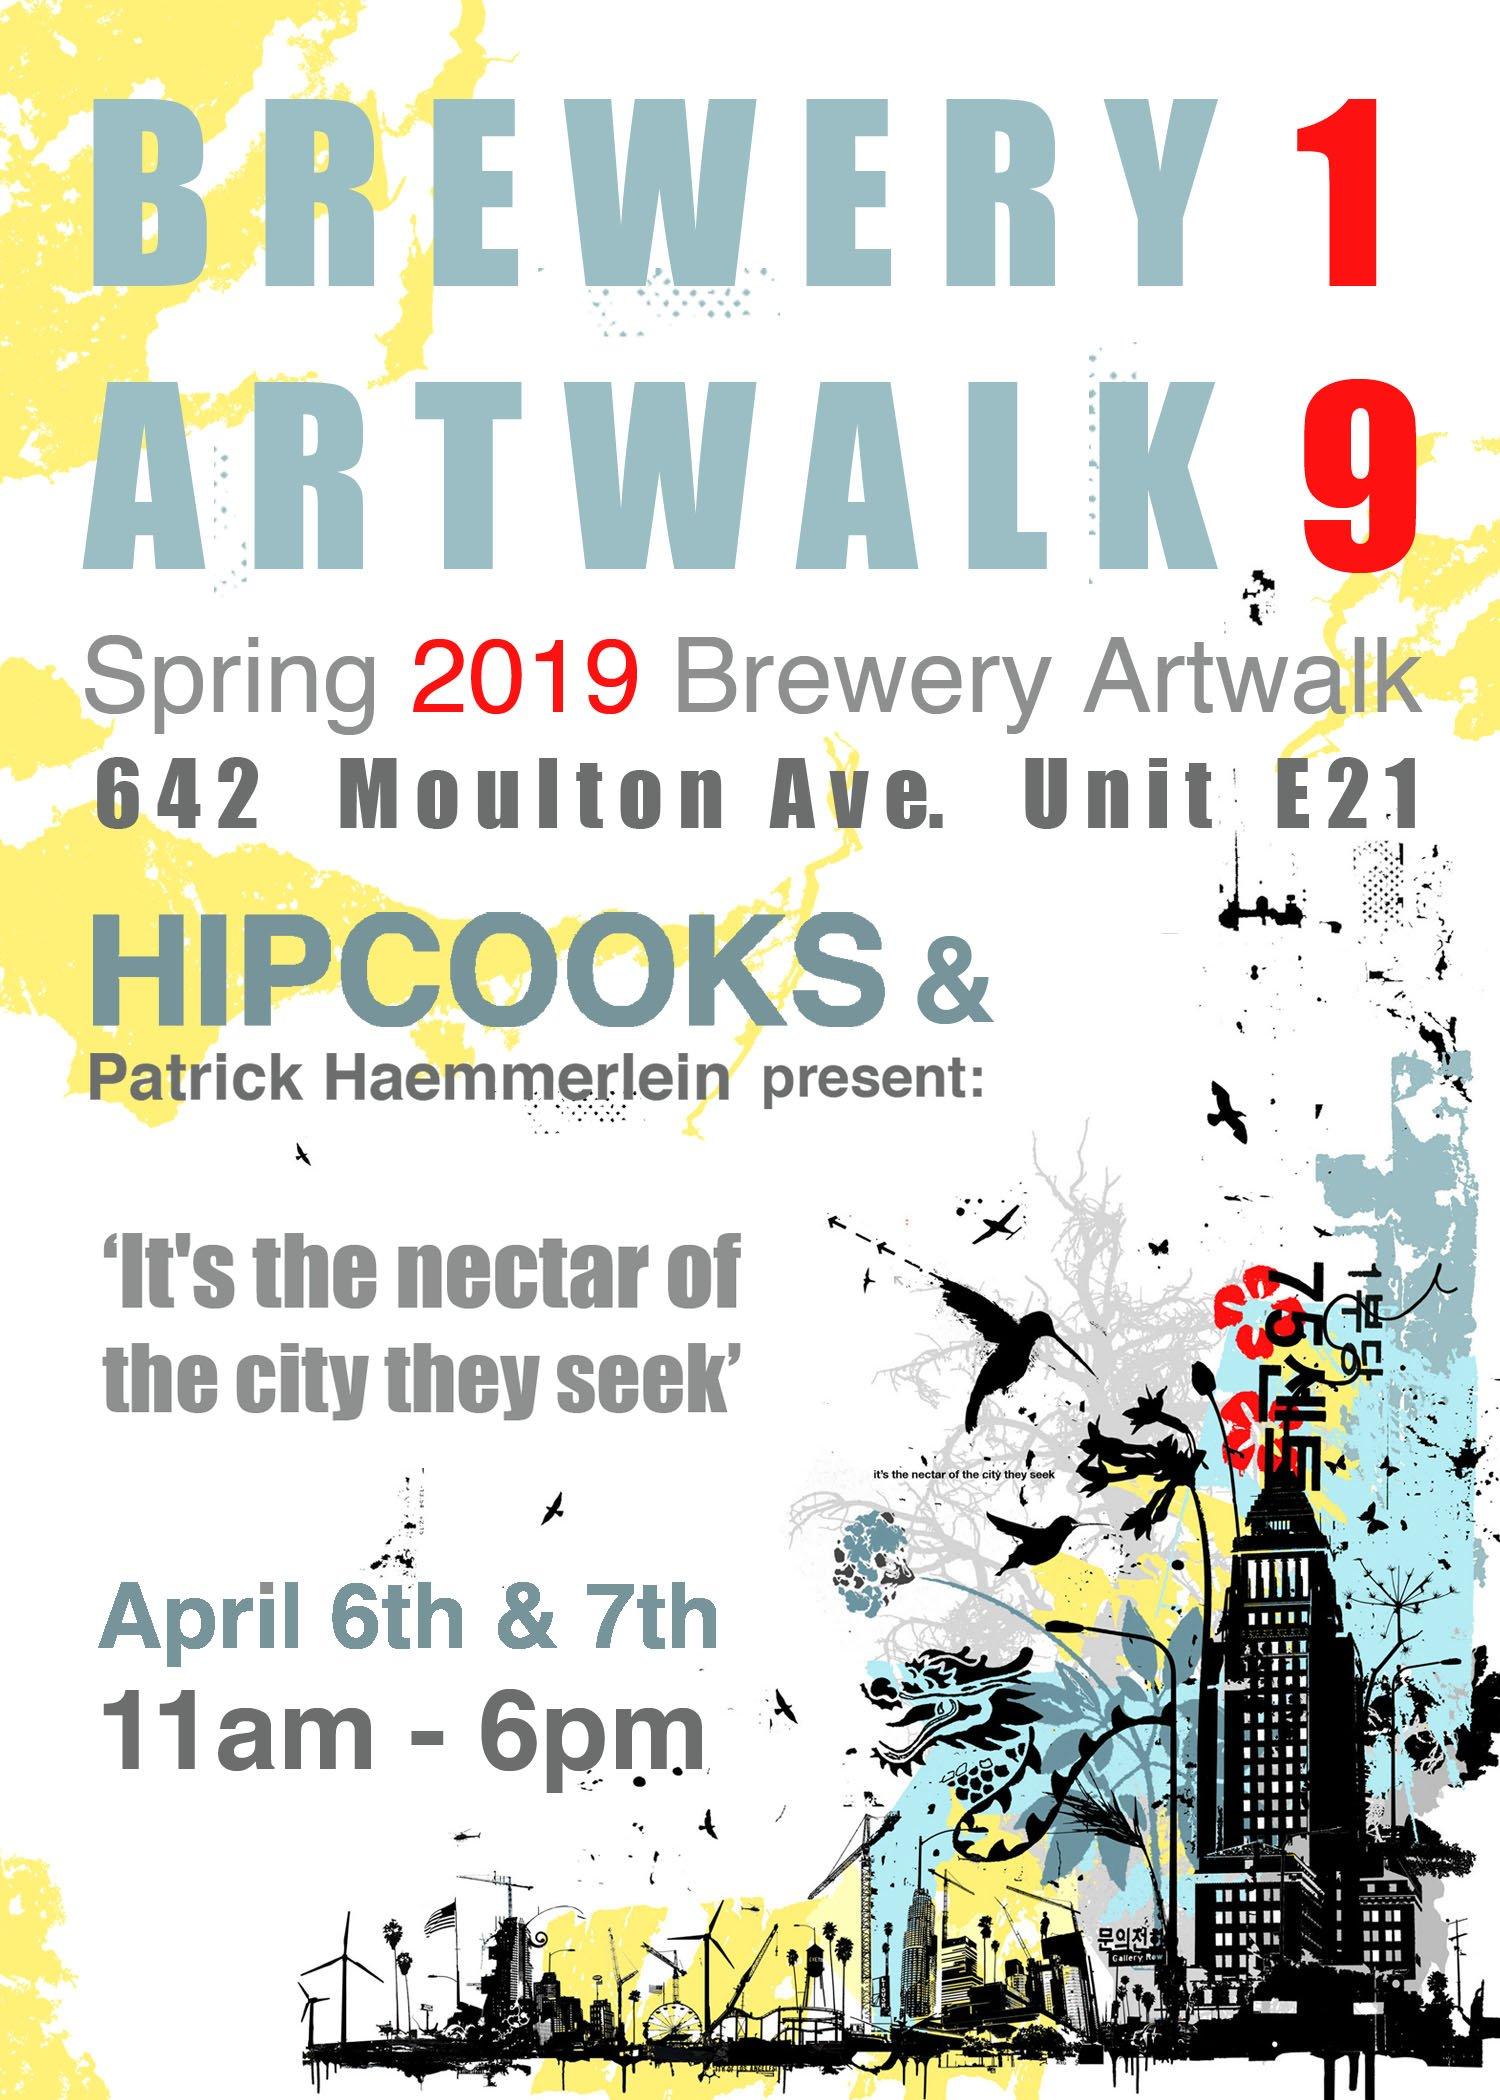 Brewery Artwalk invite at Hipcooks